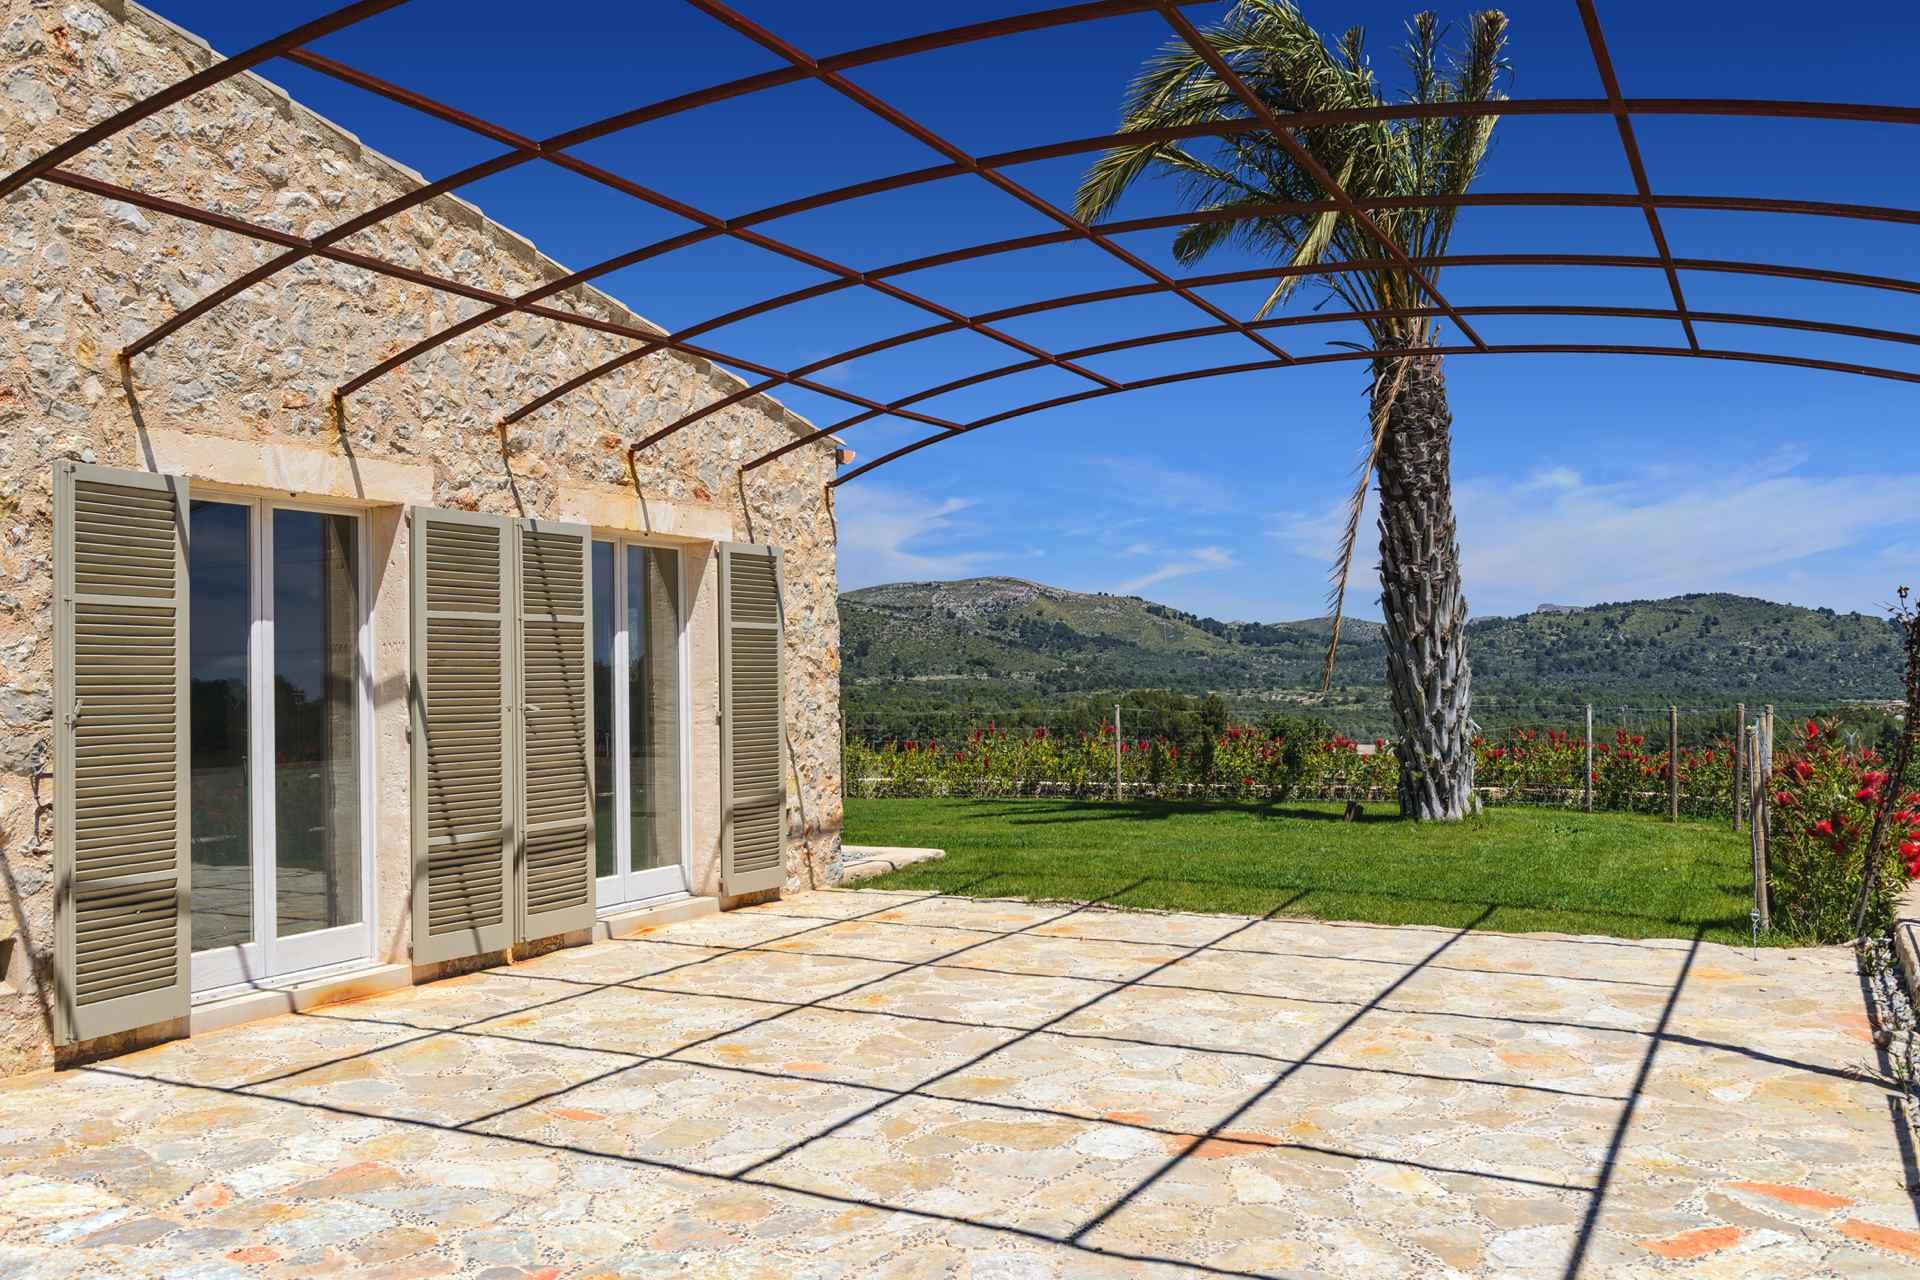 01-307 Design Finca Mallorca Nordosten Bild 6